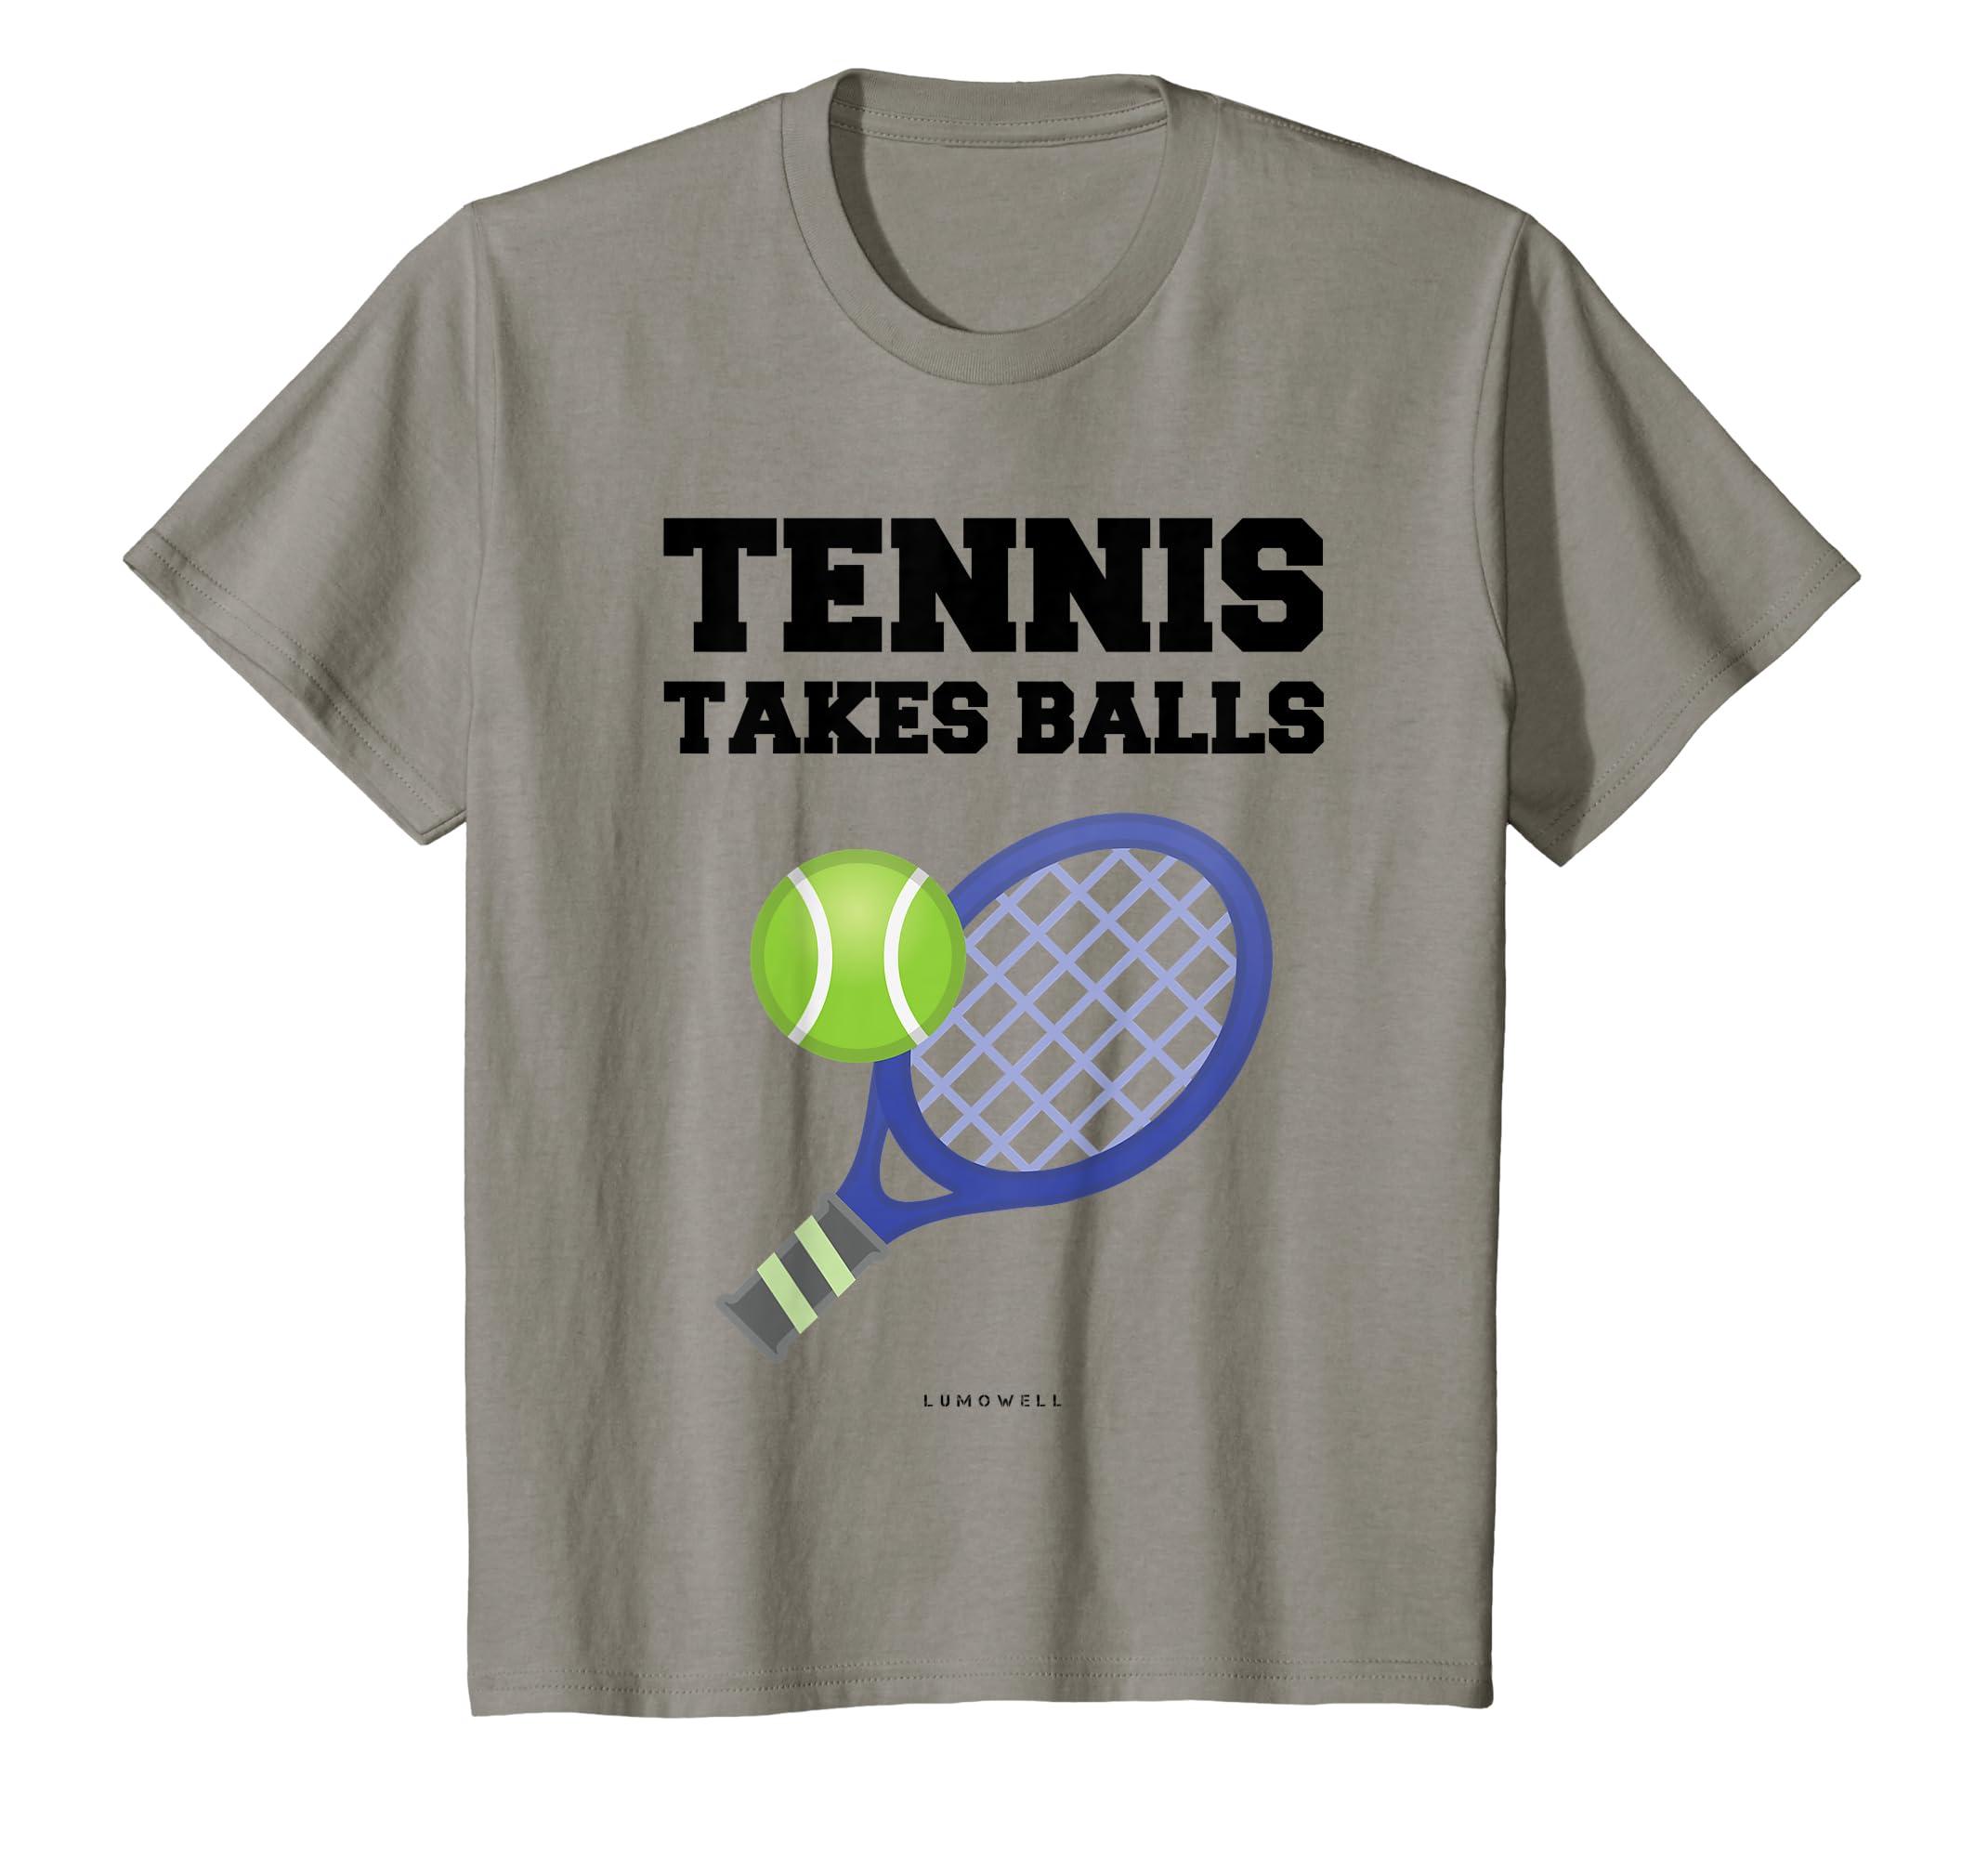 d42da511 Amazon.com: Funny Tennis T Shirts: Tennis Takes Balls Gift Tee Shirt:  Clothing